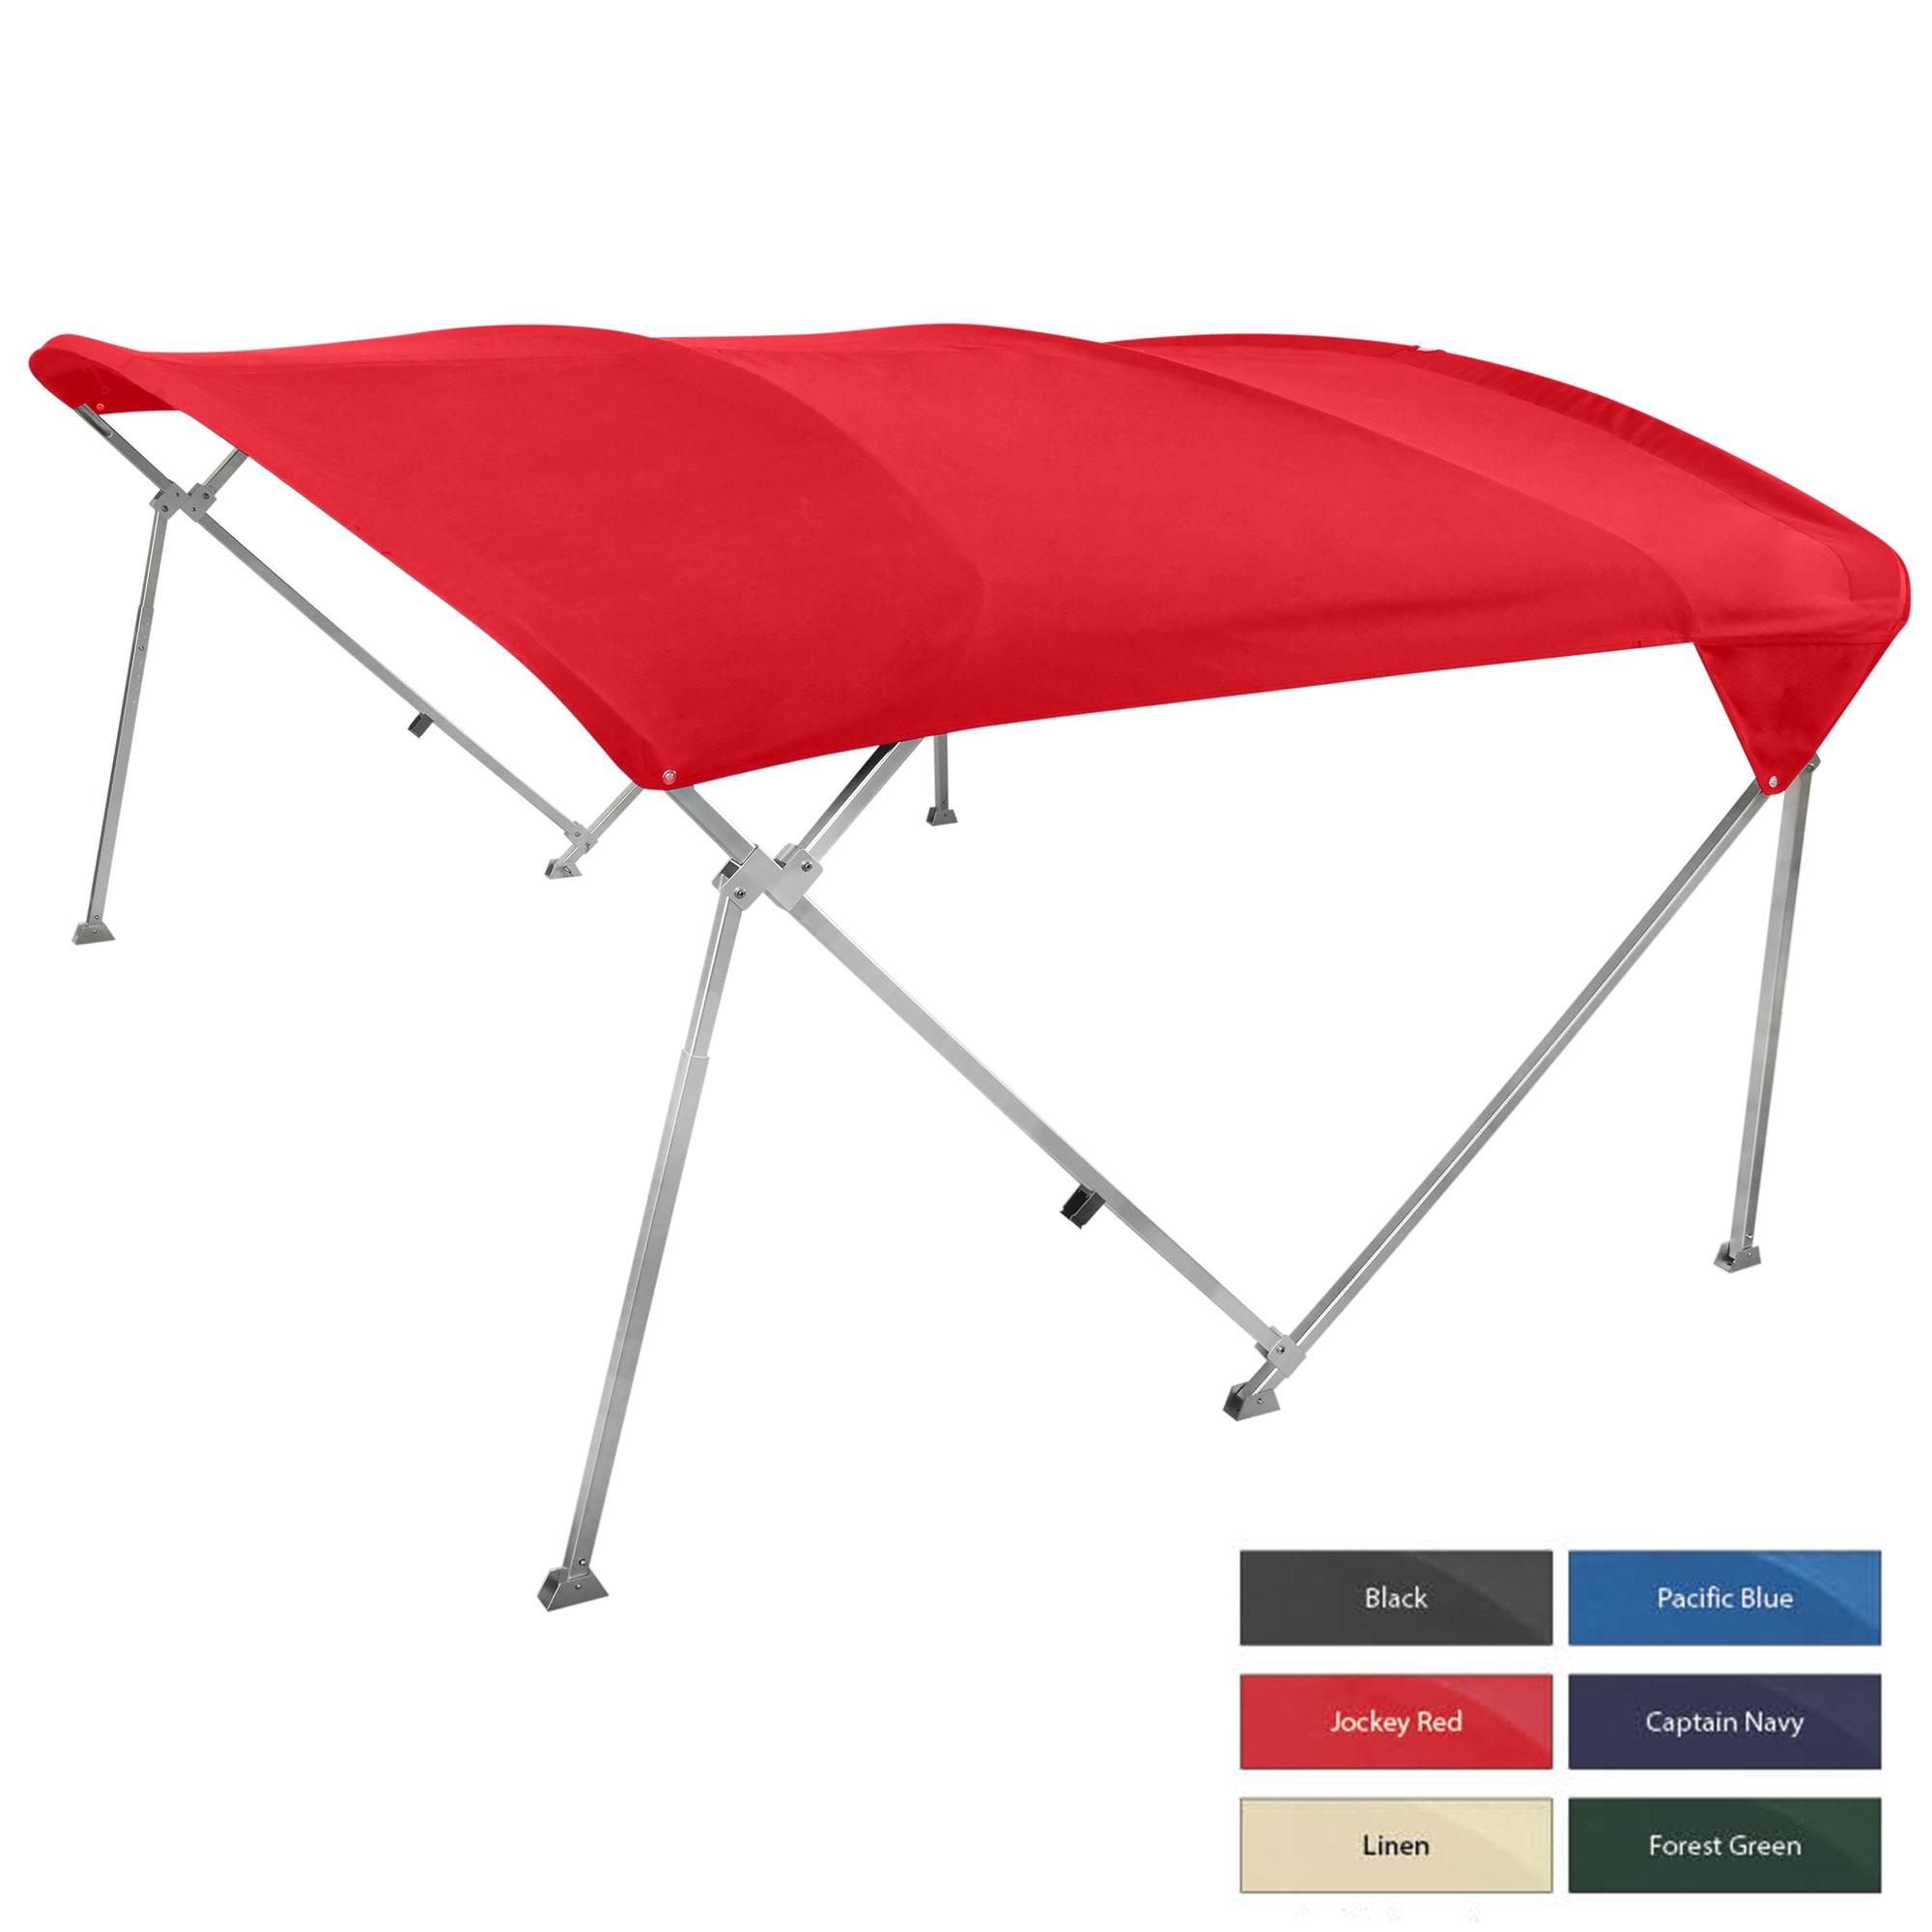 Shademate Extra Long Big Top Pontoon Bimini Top, Sunbrella Acrylic, 1